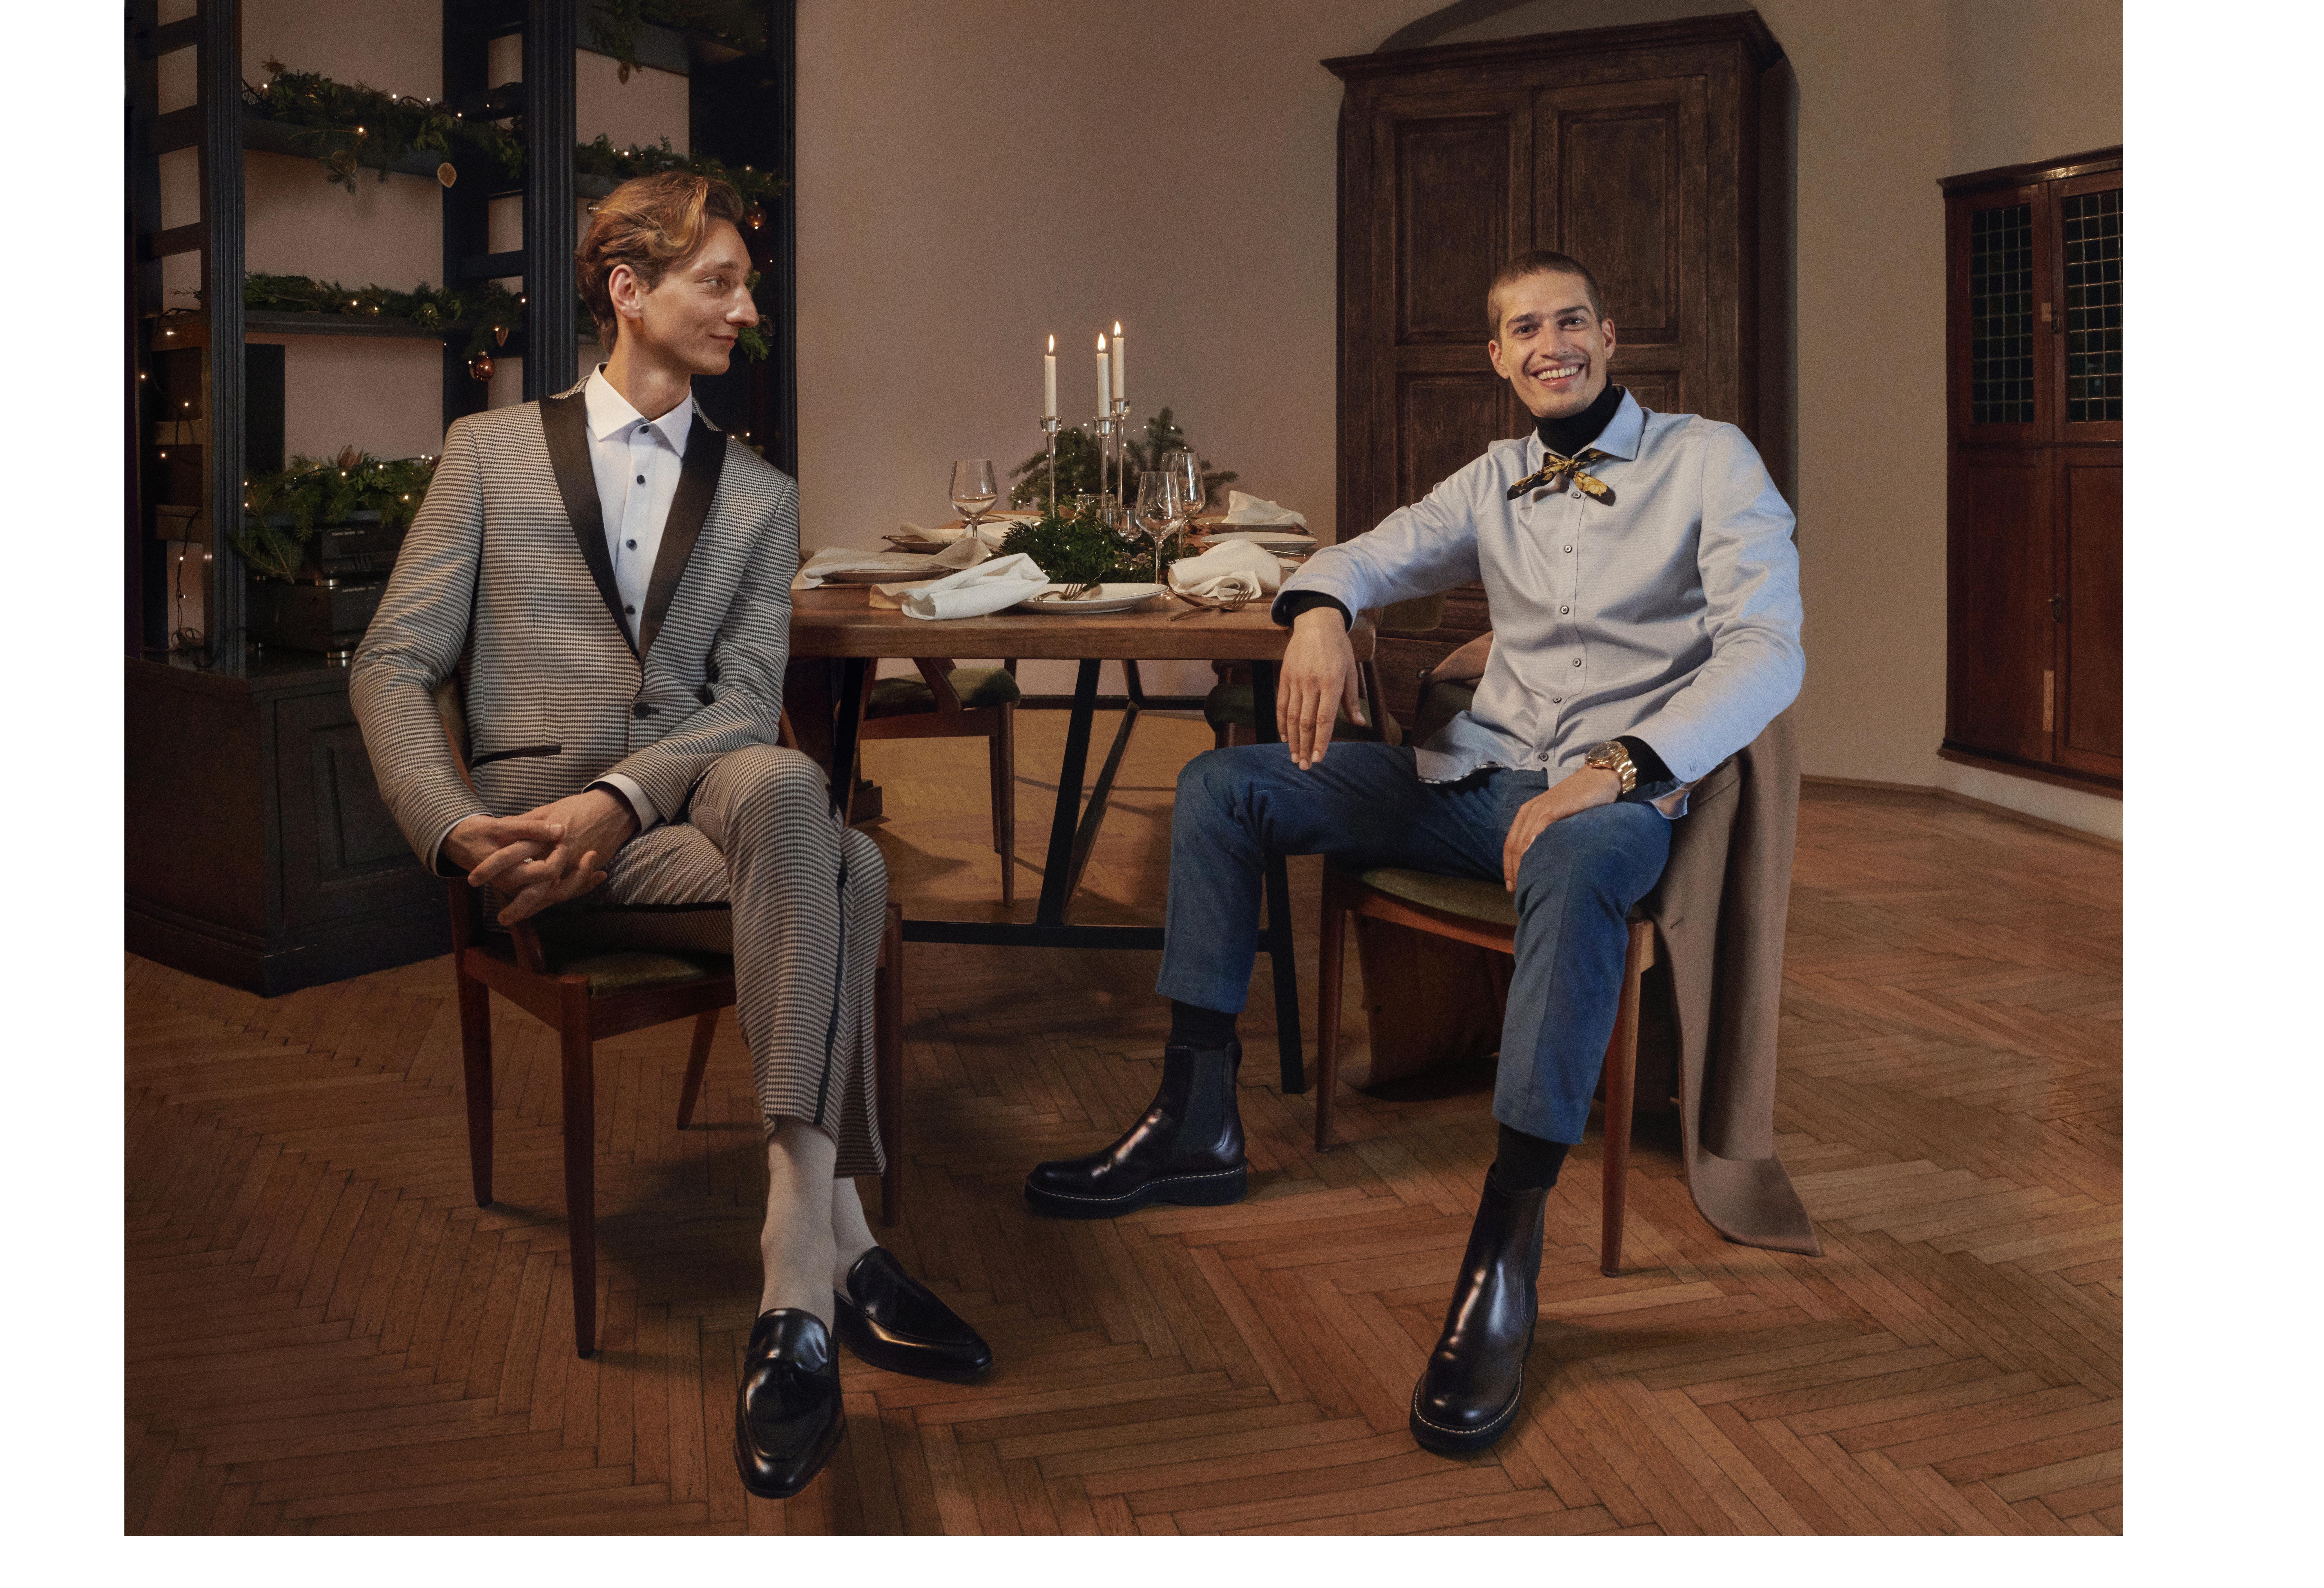 Zalando_SE_Press Release Christmas Campaign Dinner 2